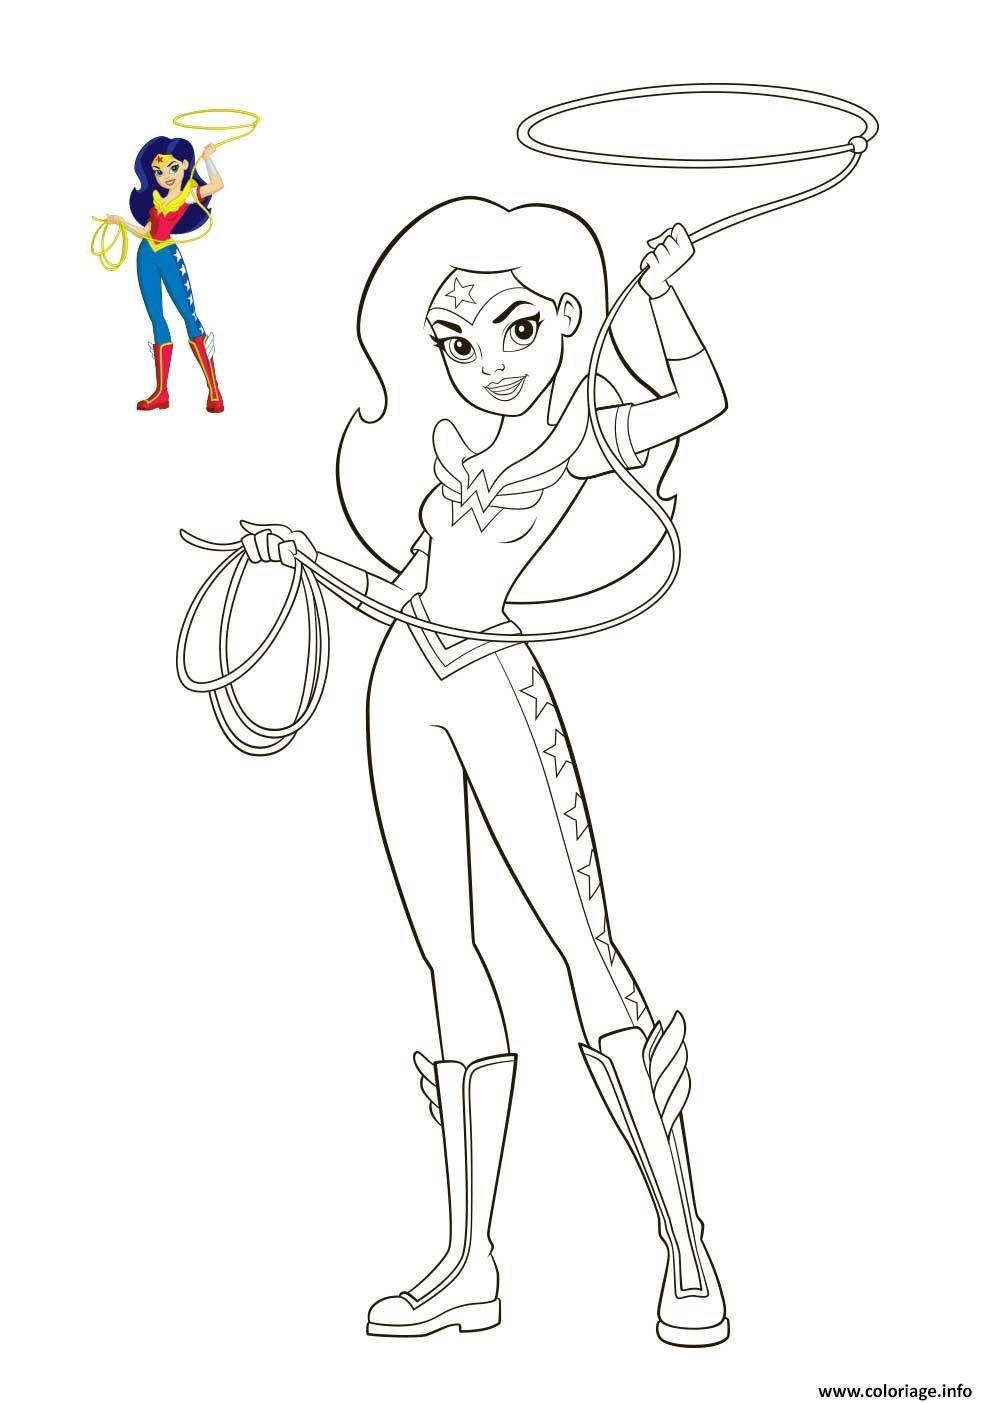 Coloriage wonder woman dc super hero girls dessin - Coloriage wonder woman ...